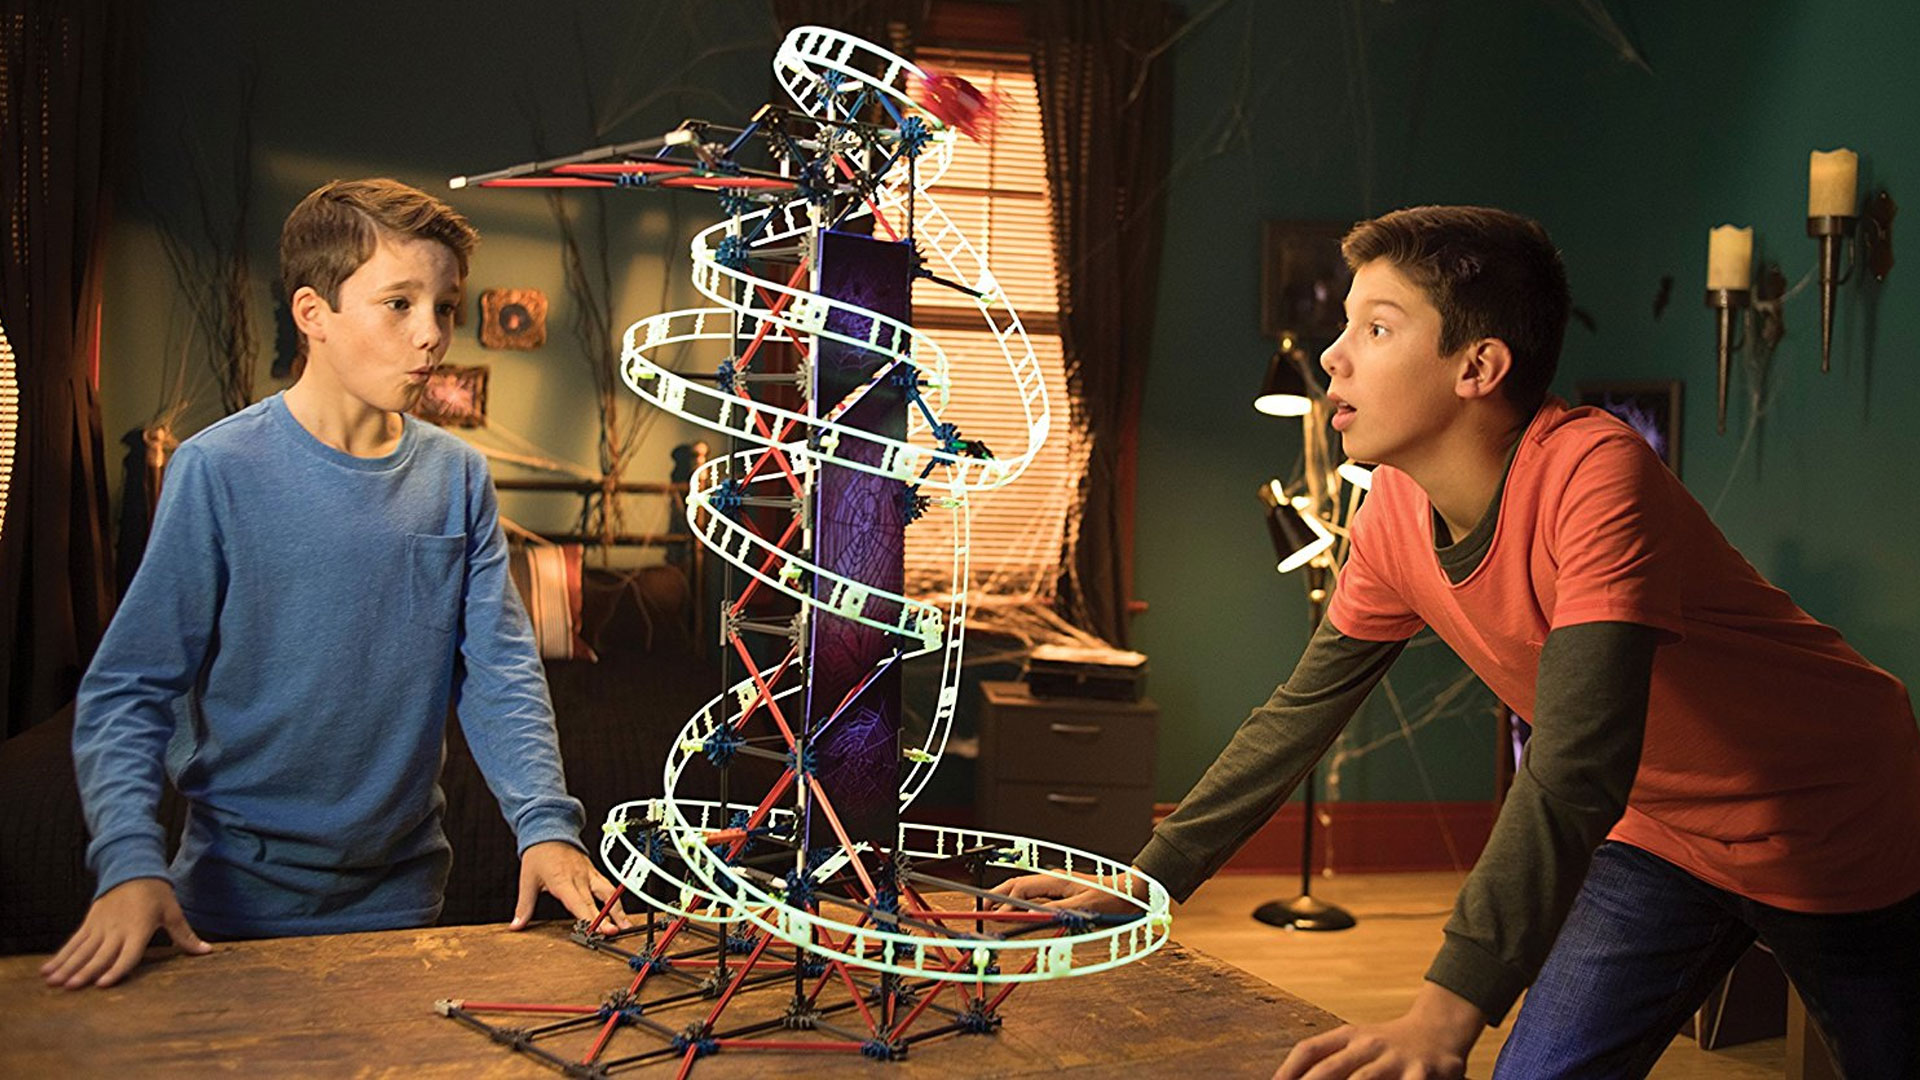 Build this roller coaster K'NEX set w/ your kids this fall: $35 (Reg. $50)